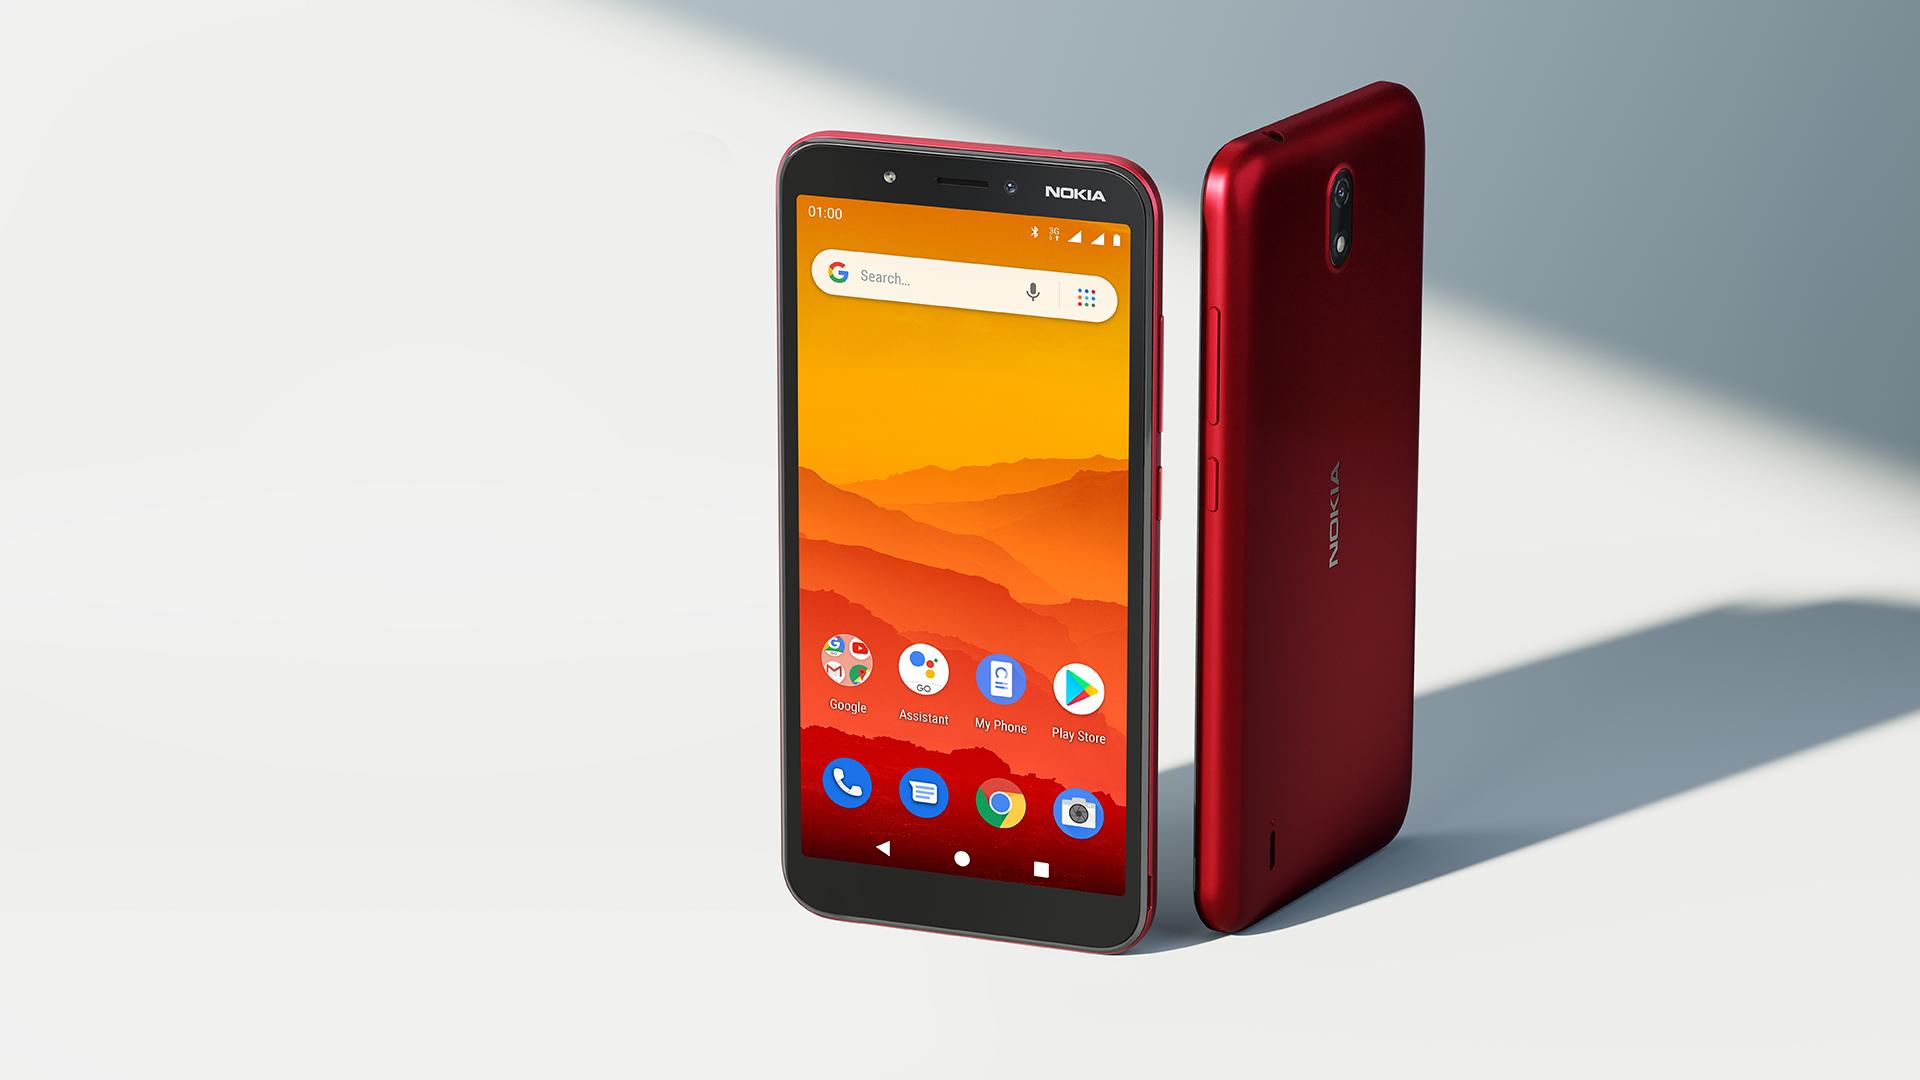 Nokia C1_RED_only_HS_JPG